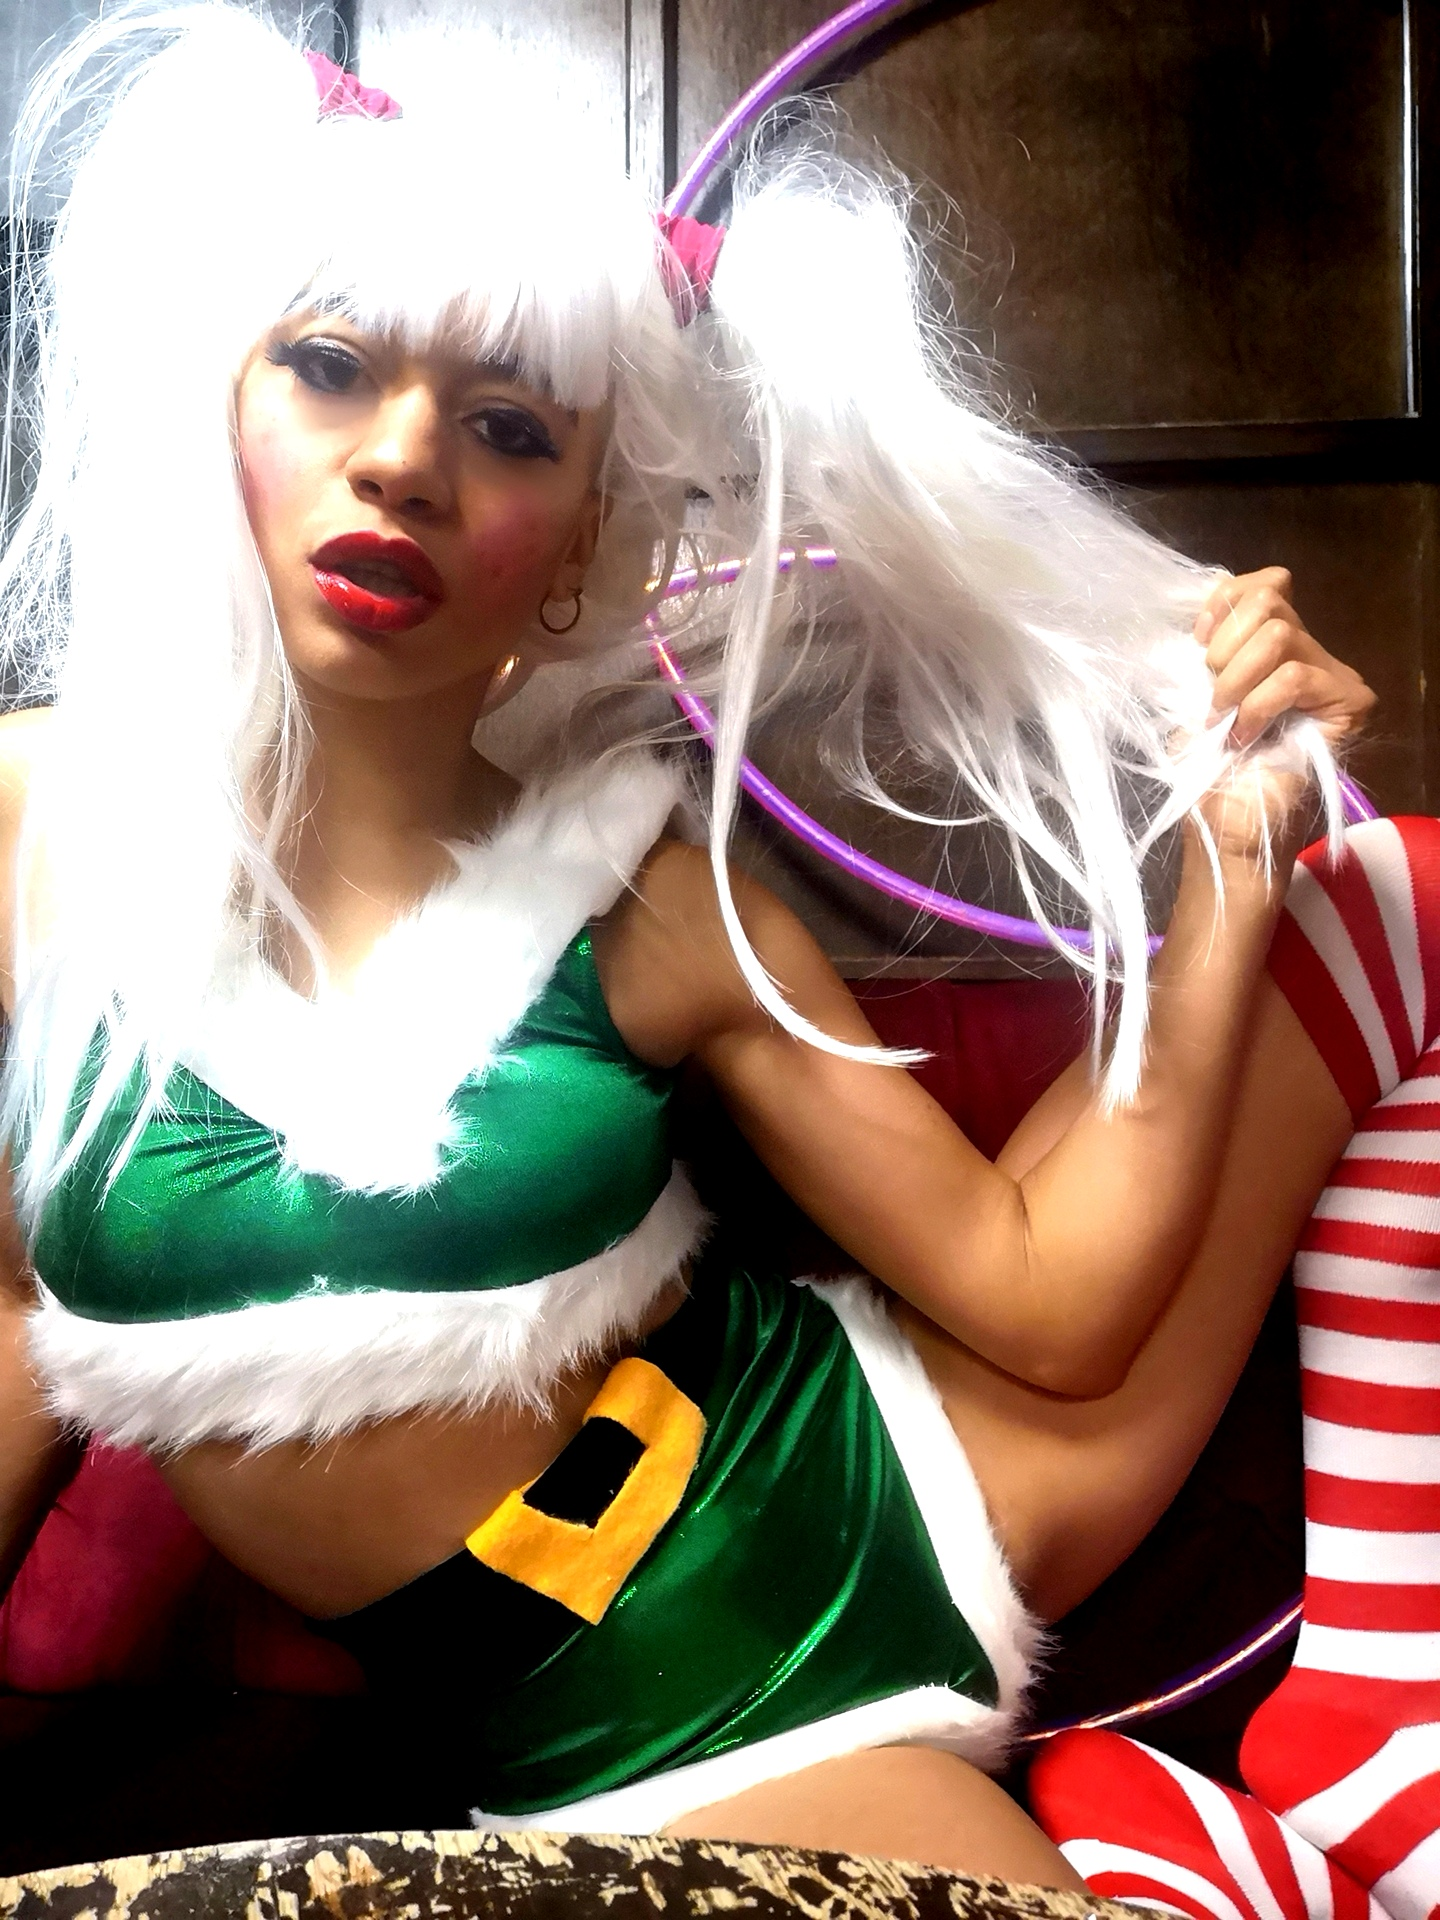 Santa's lil helper at Sleaze (Xmas Edition)